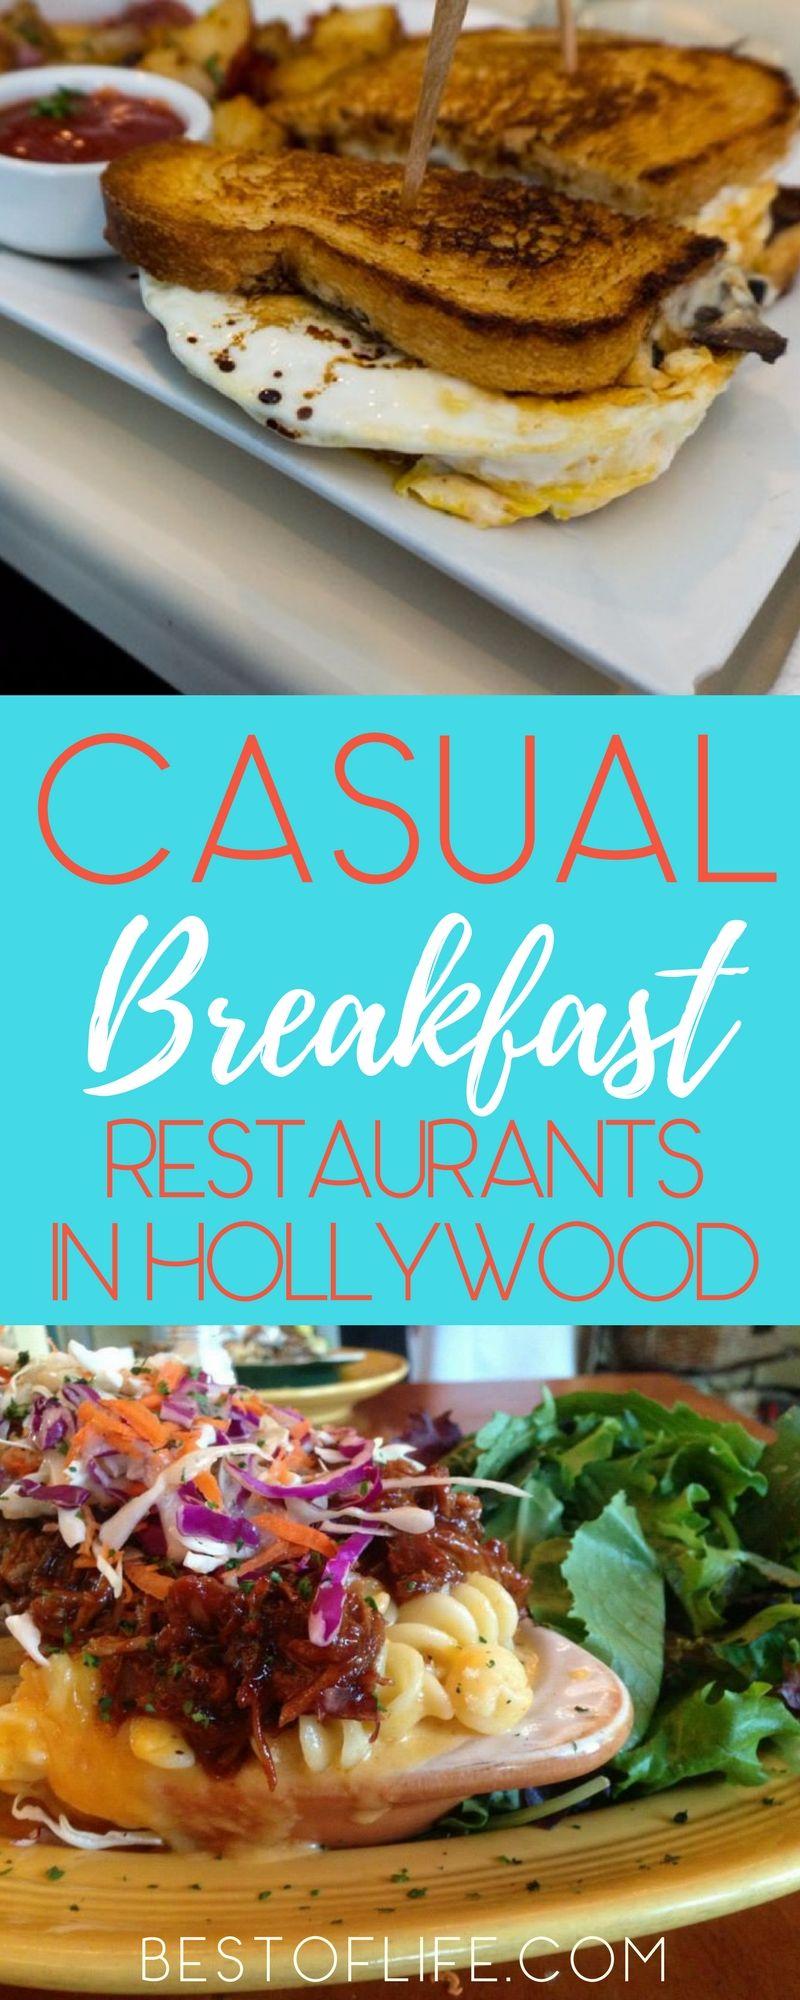 5 Casual Breakfast Restaurants In Hollywood California